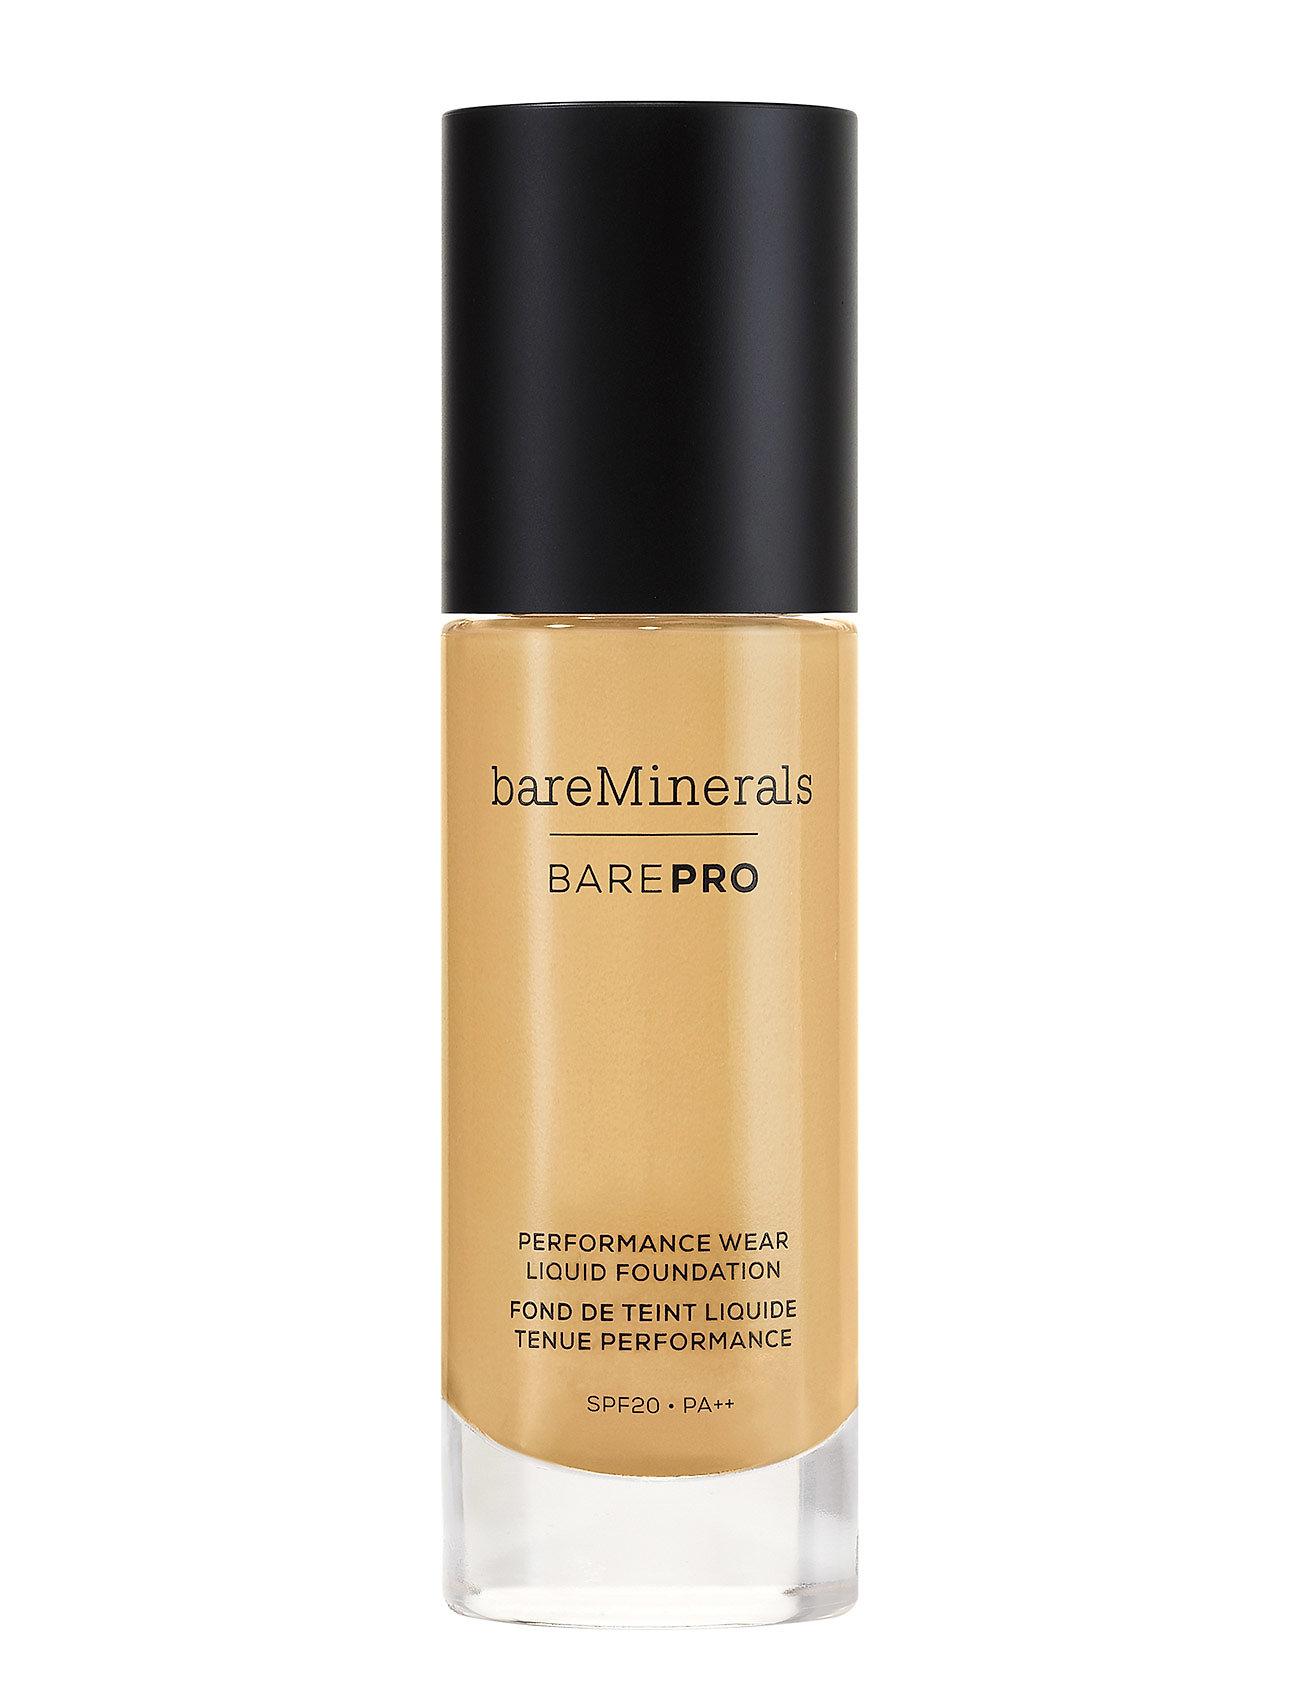 Image of Barepro Performance Wear Liquid Foundation Spf 20 Foundation Makeup BareMinerals (3067521653)